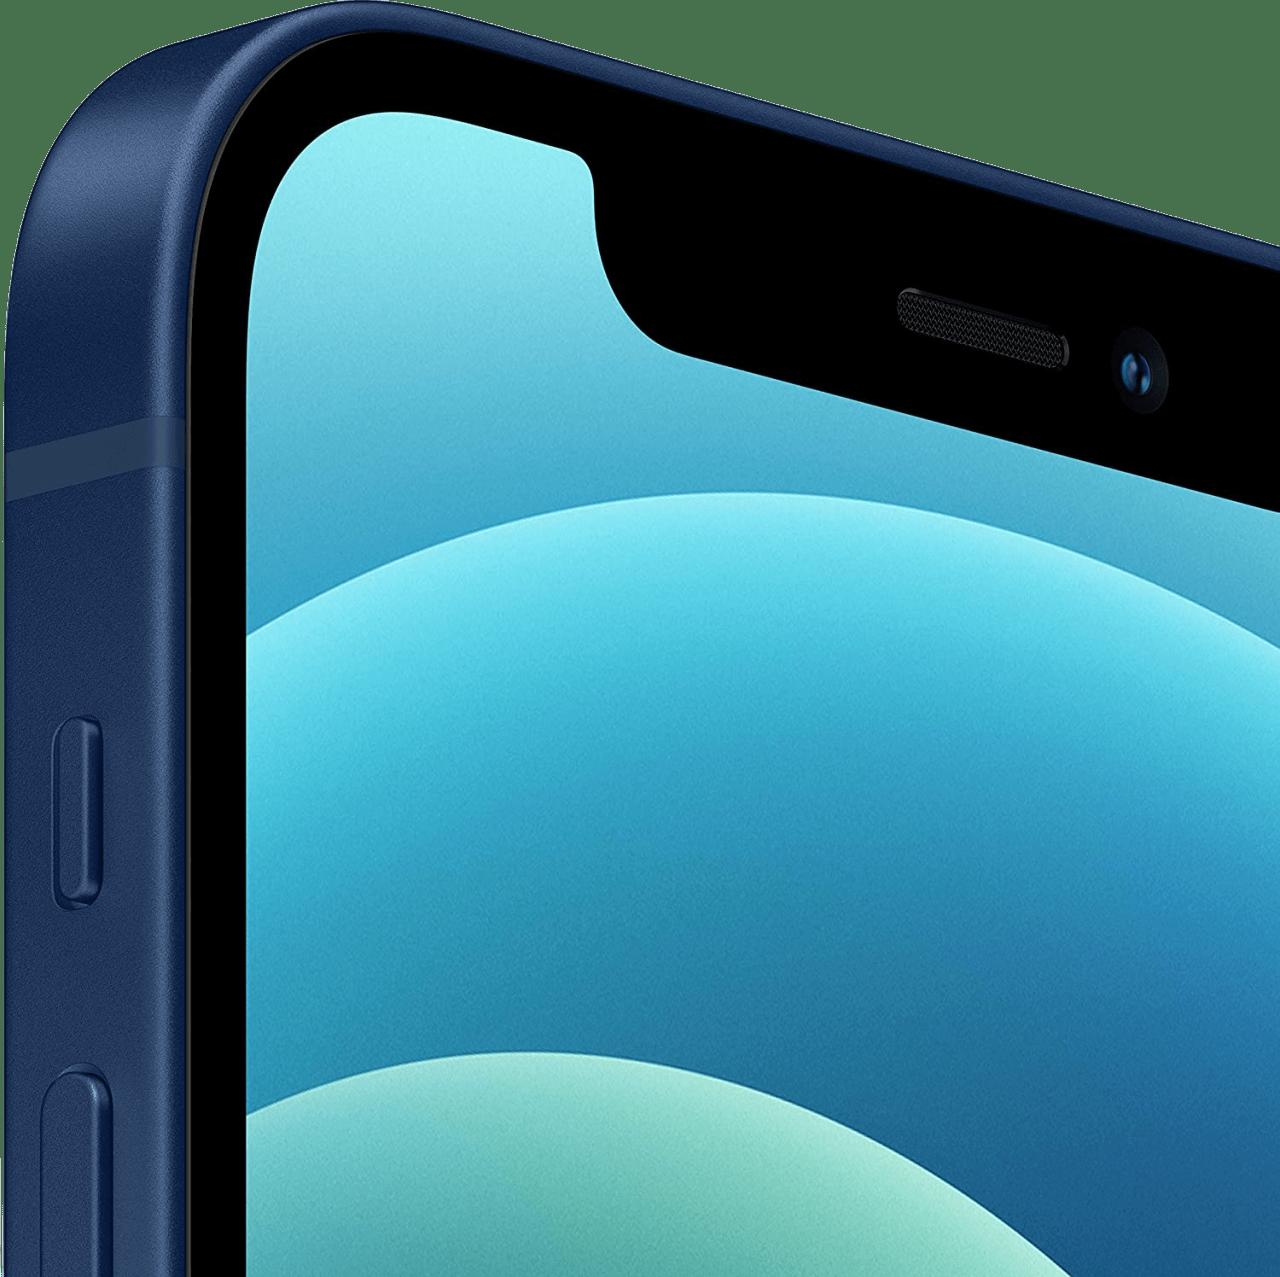 Blau Apple iPhone 12 mini - 128GB - Dual SIM.3